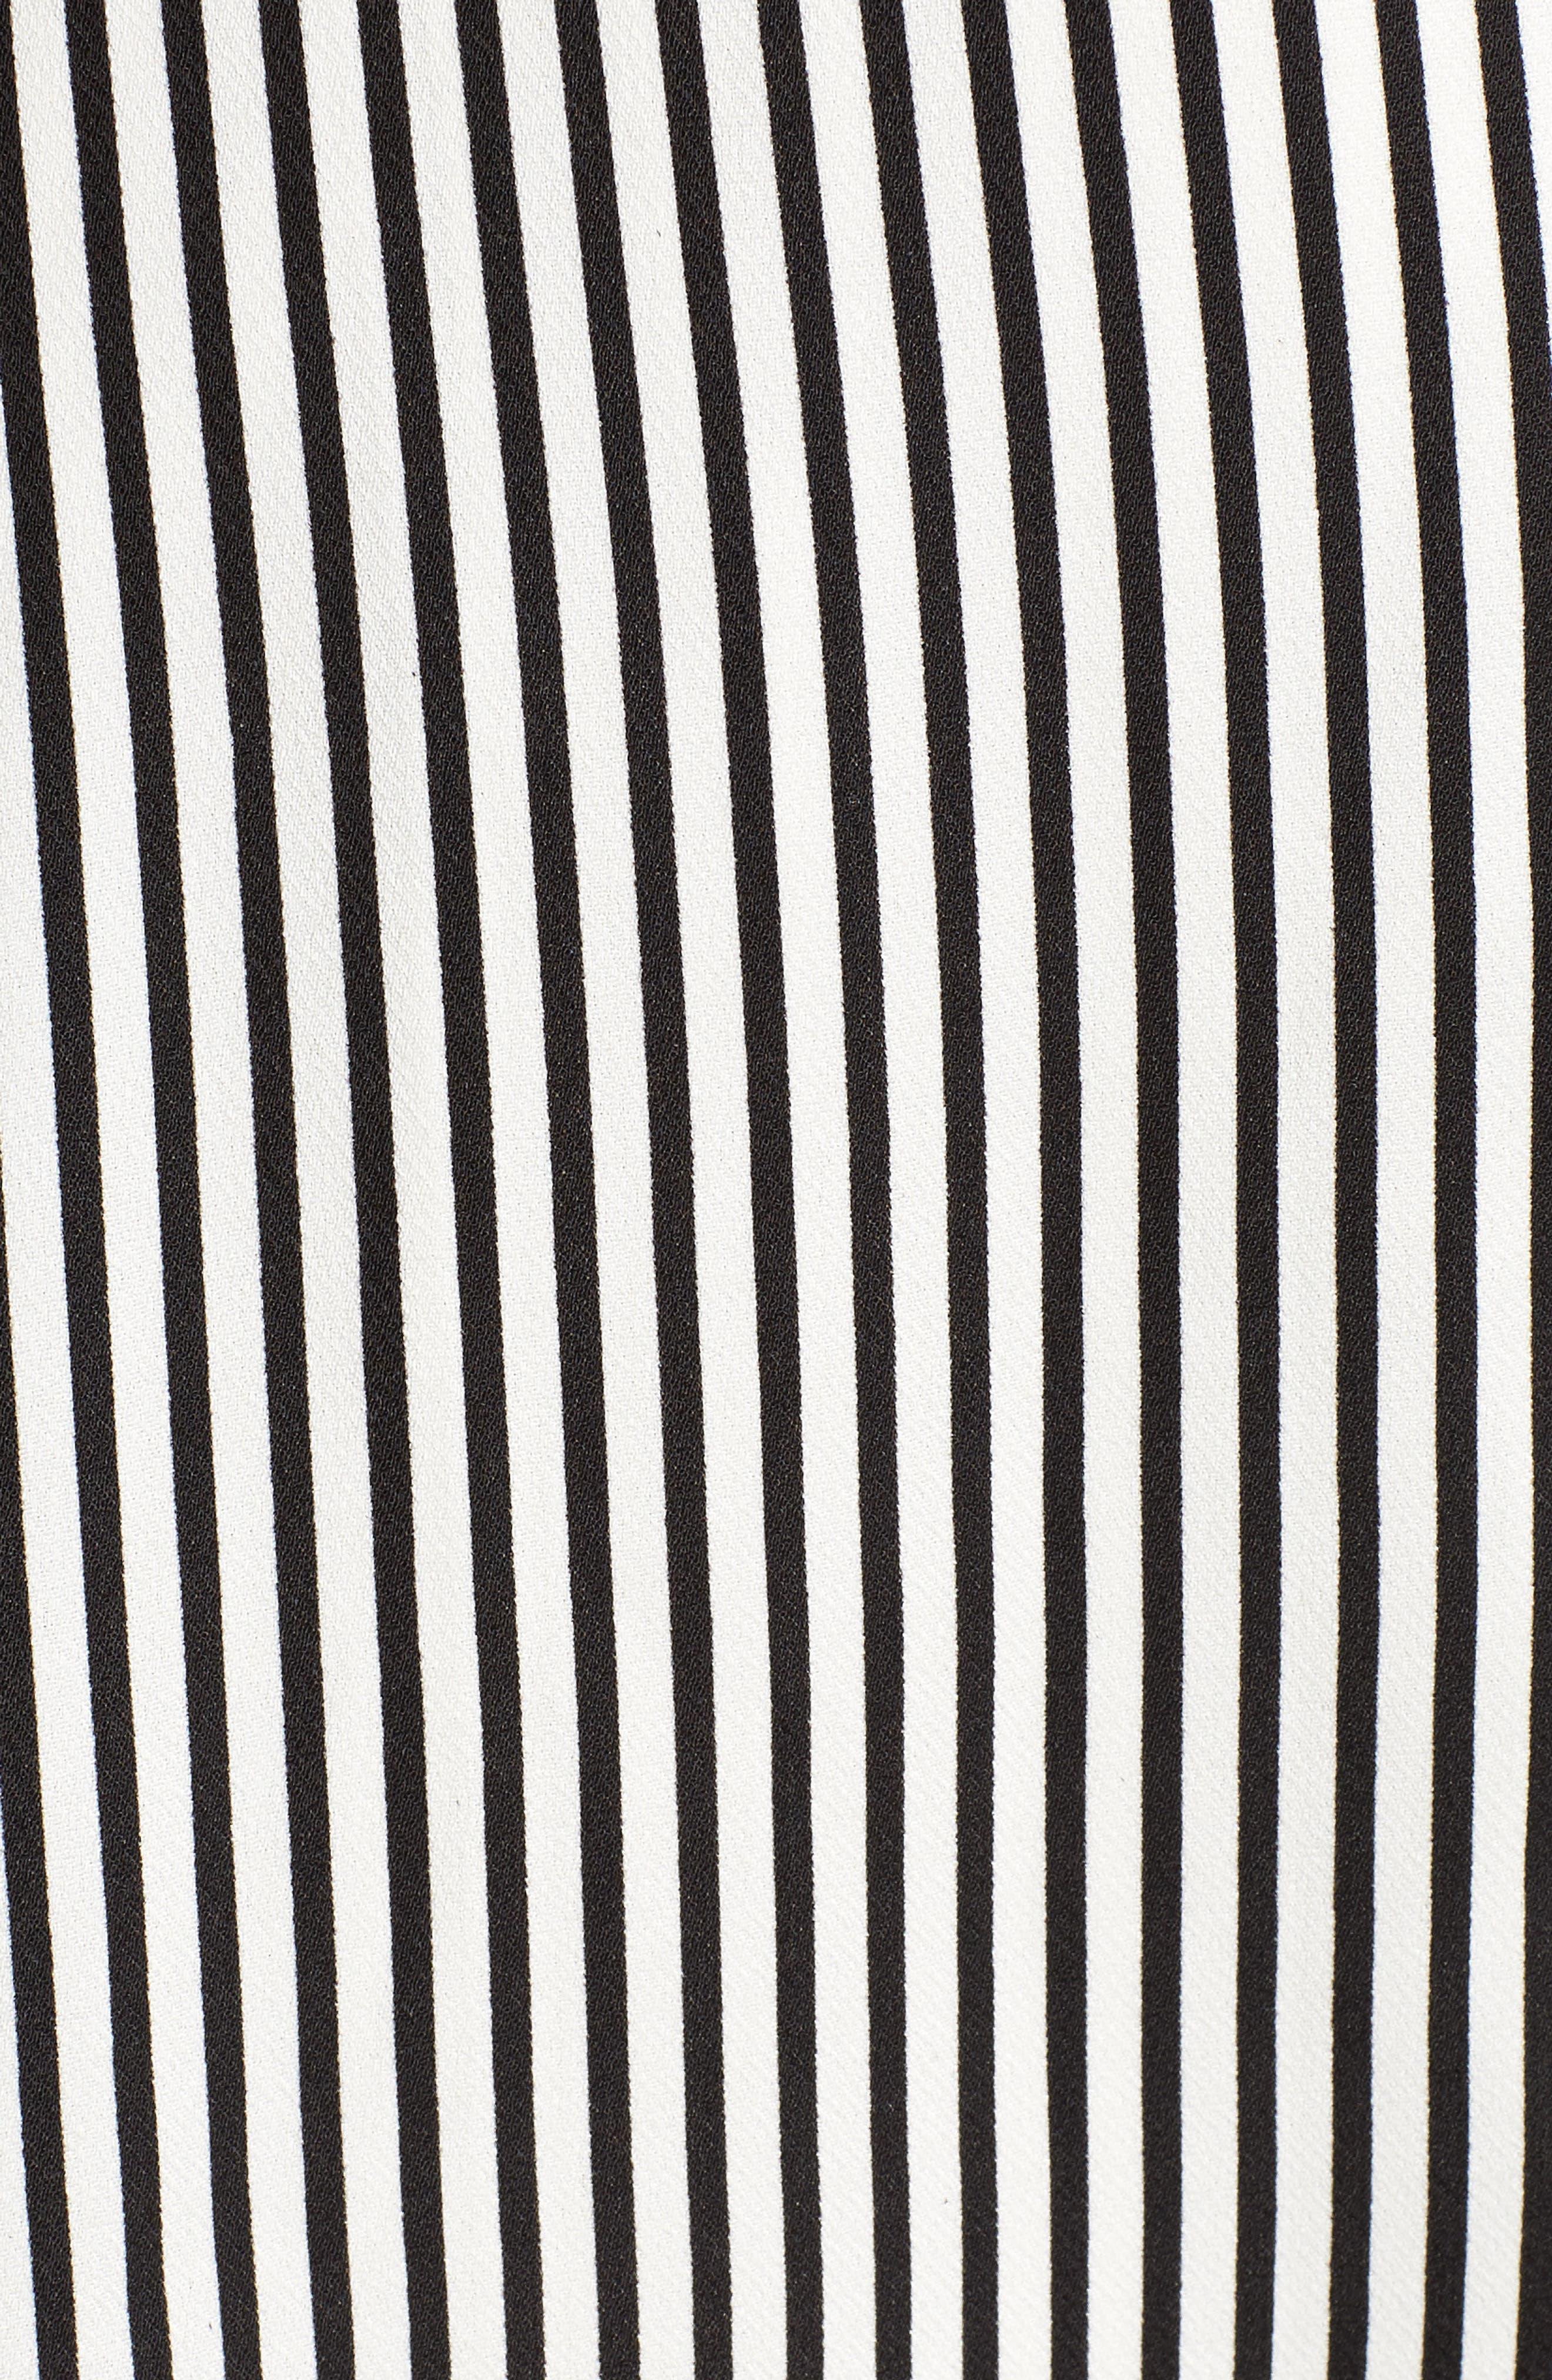 Bishop + Young Ana Stripe Shark Bite Hem Halter Dress,                             Alternate thumbnail 6, color,                             Black Stripe